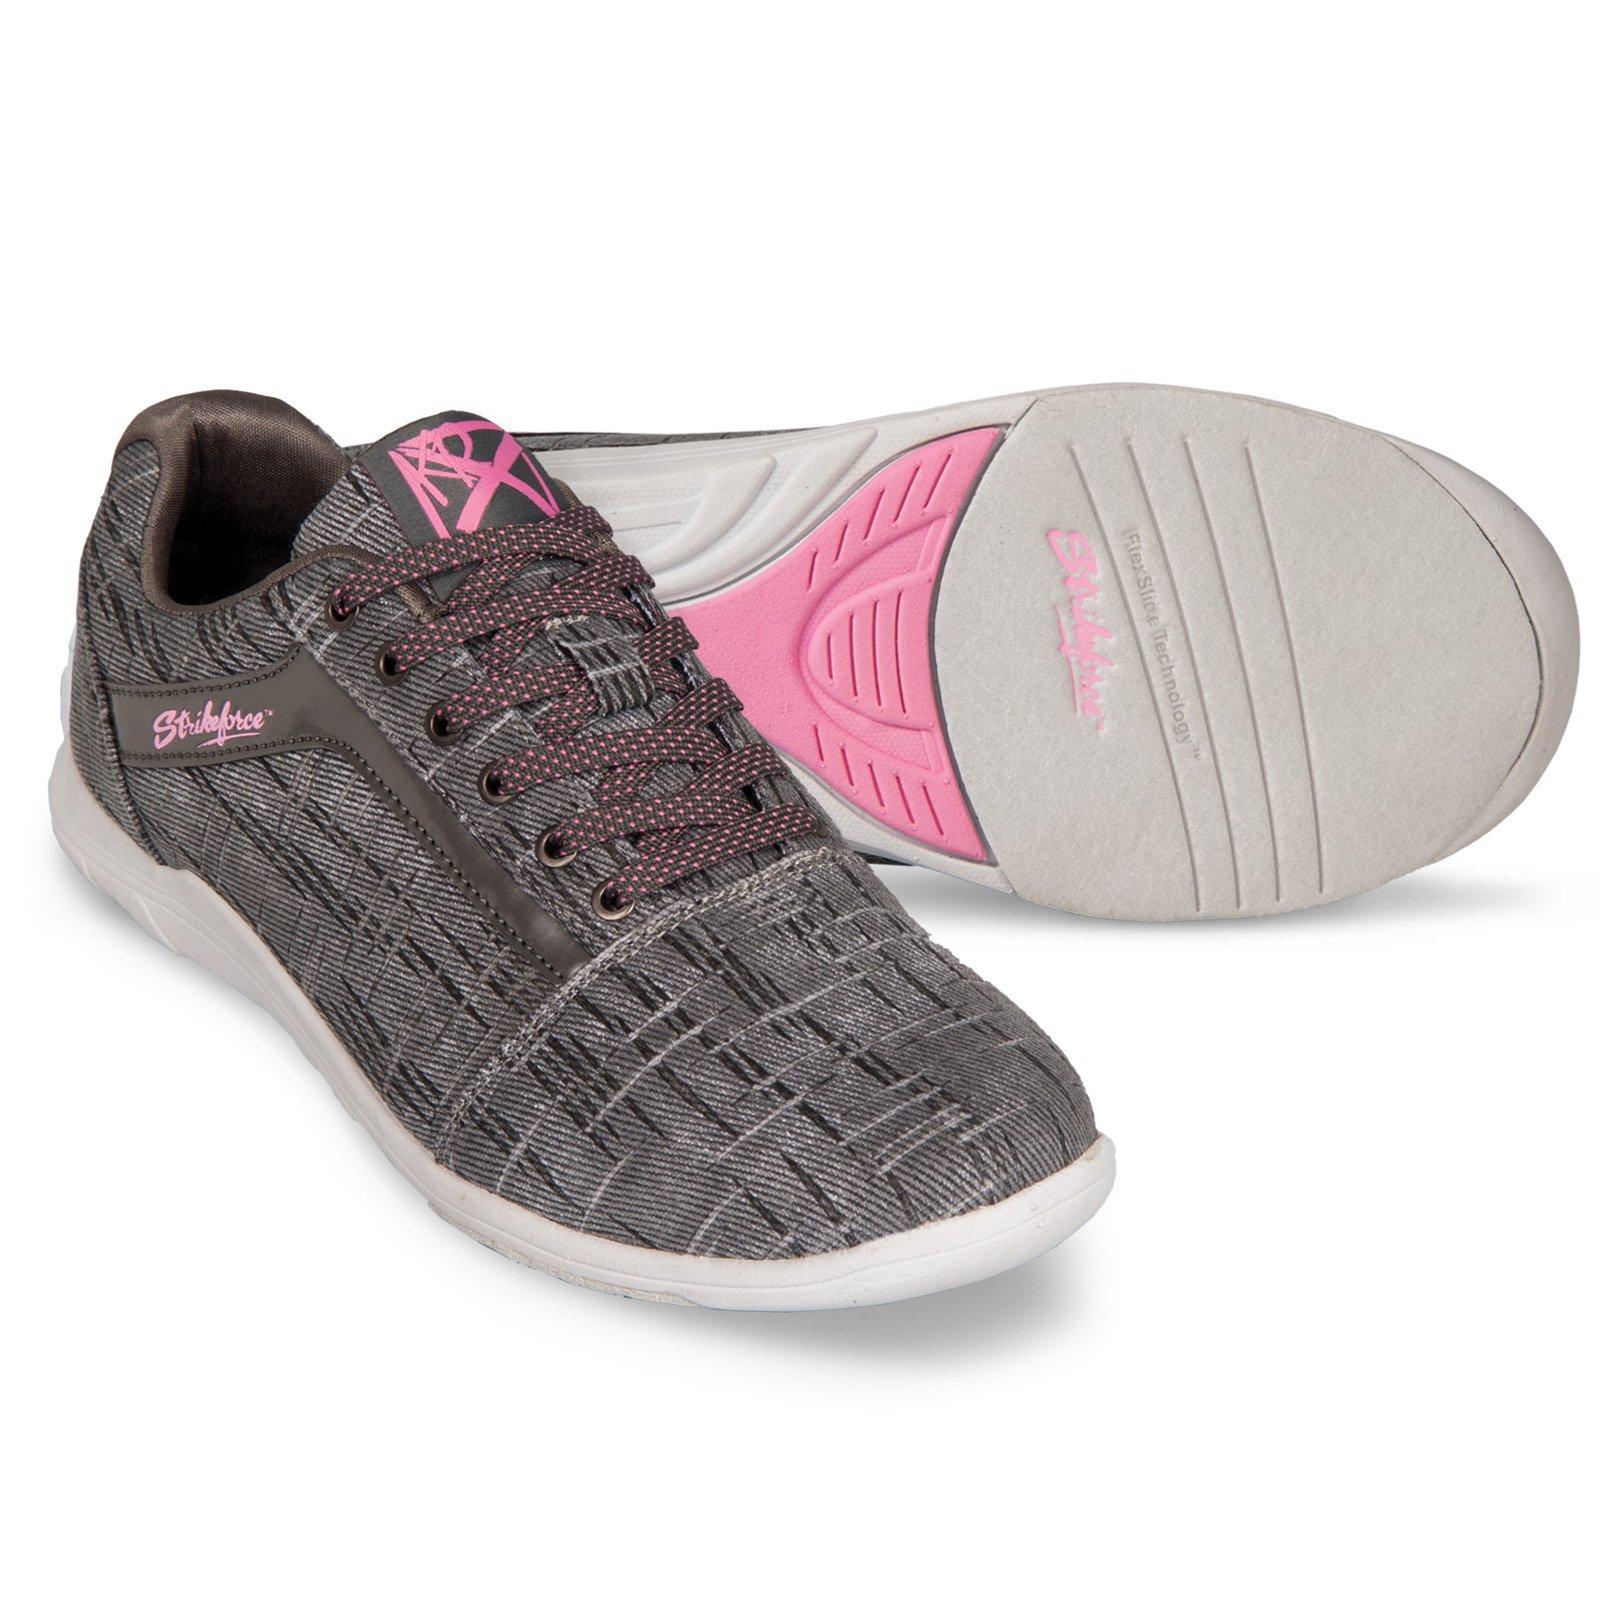 KR Nova Lite Ladies Ash/Hot Pink Wide Size 6 by KR Strikeforce